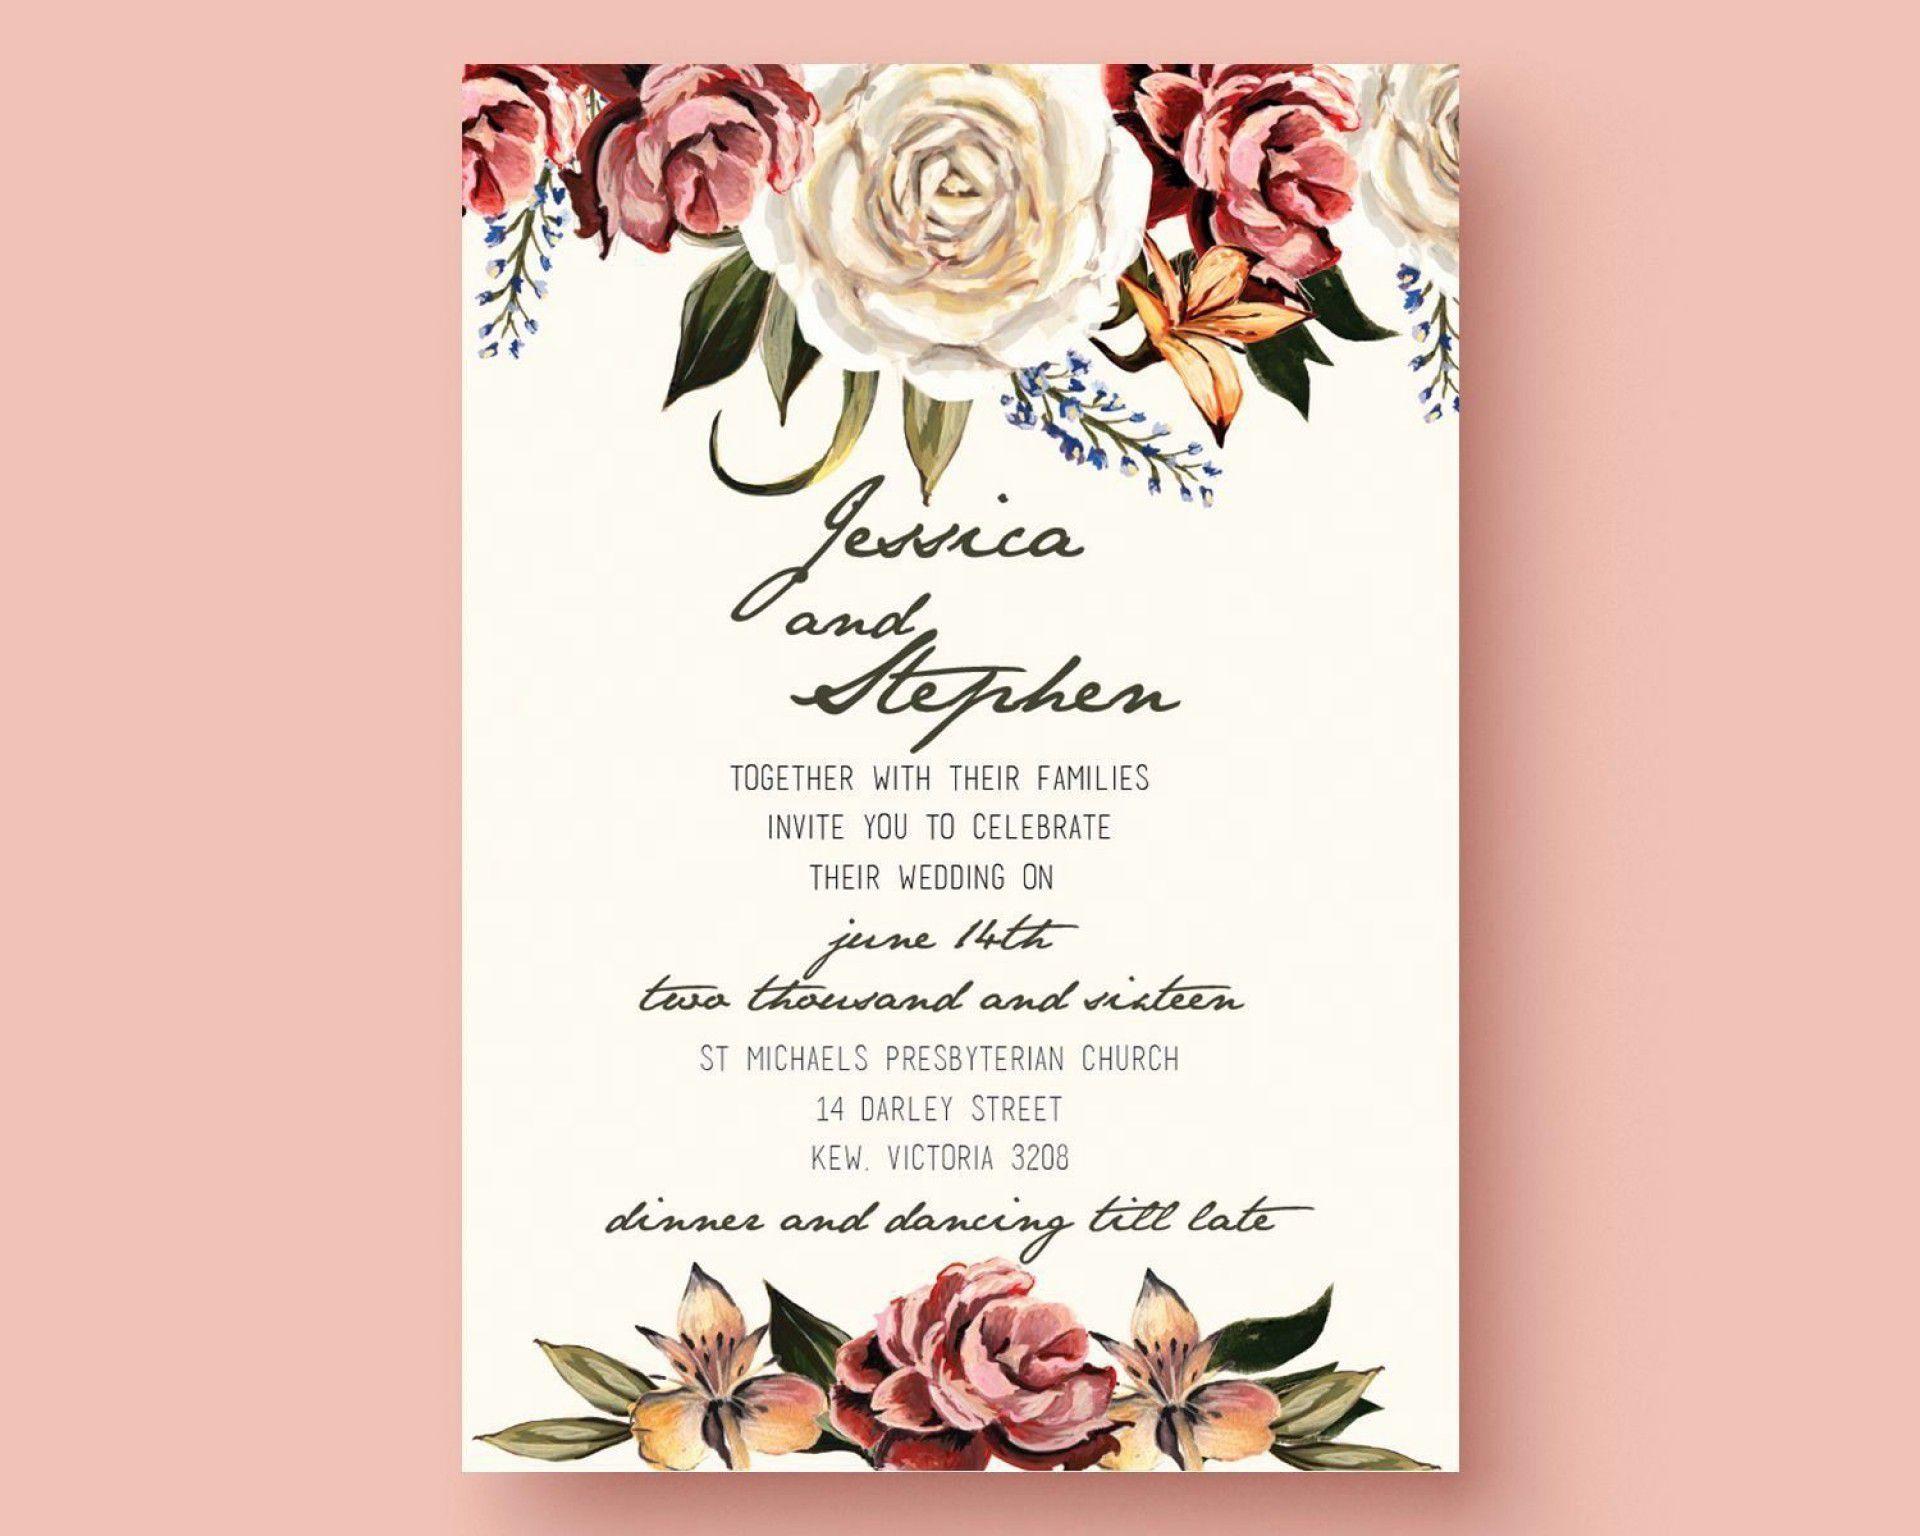 005 Rare Sample Wedding Invitation Template Free Download High Resolution  WordingFull